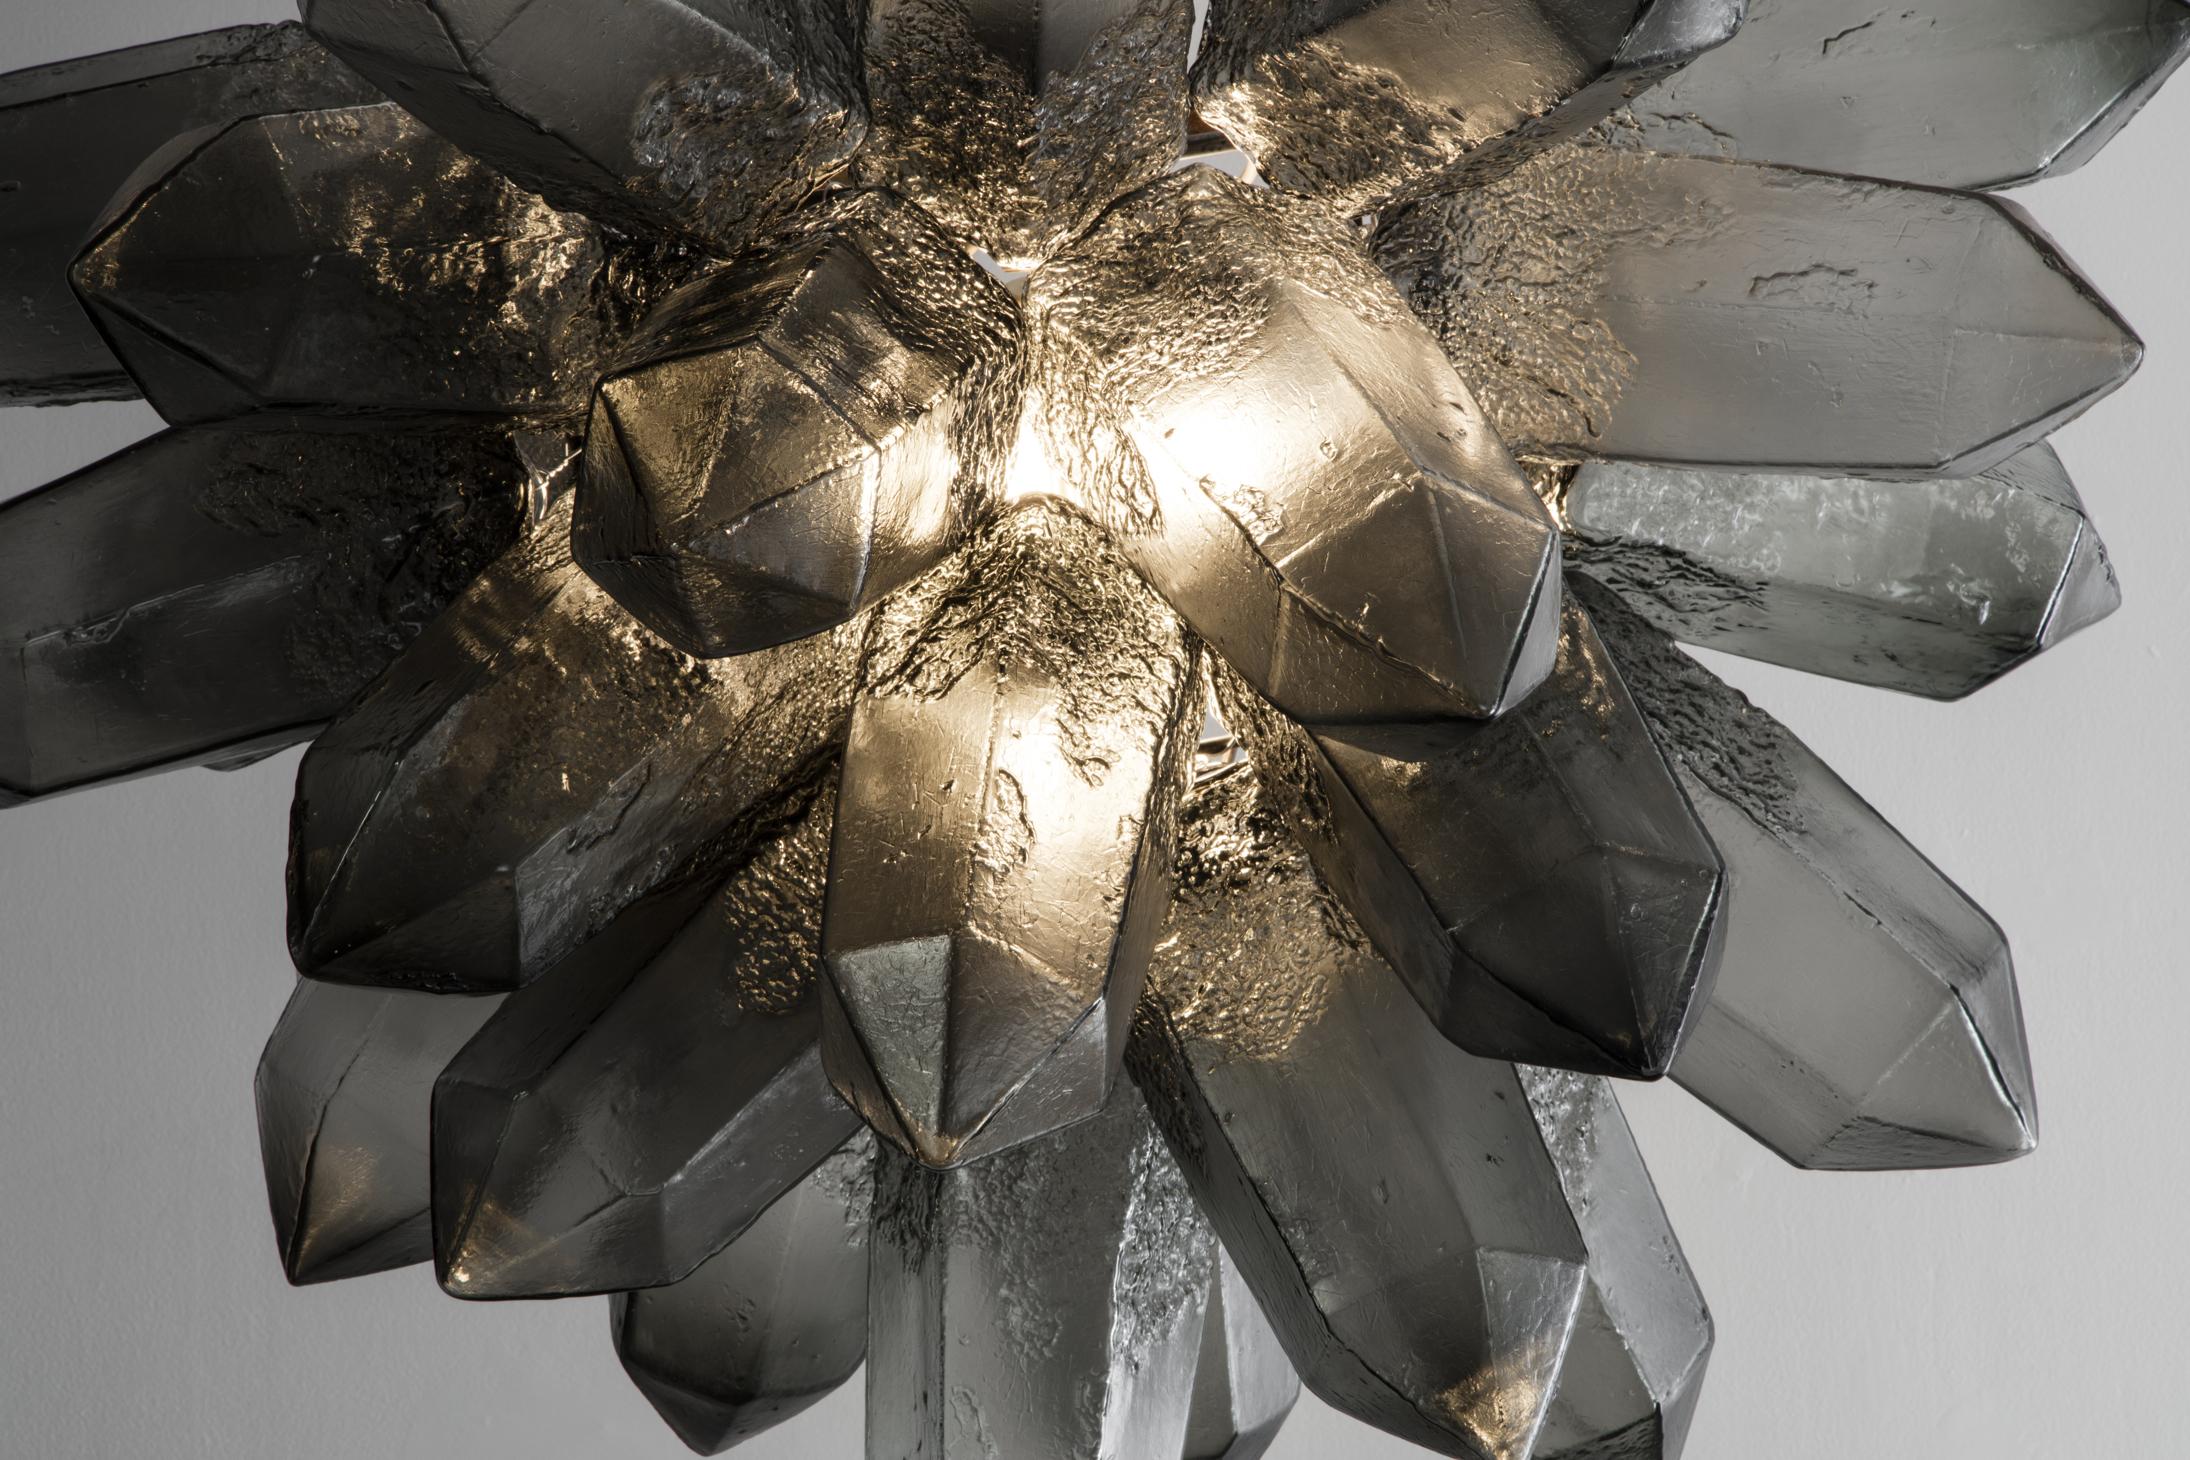 Jeff Zimmermans Sculptural Lamps Gleam as Lighting